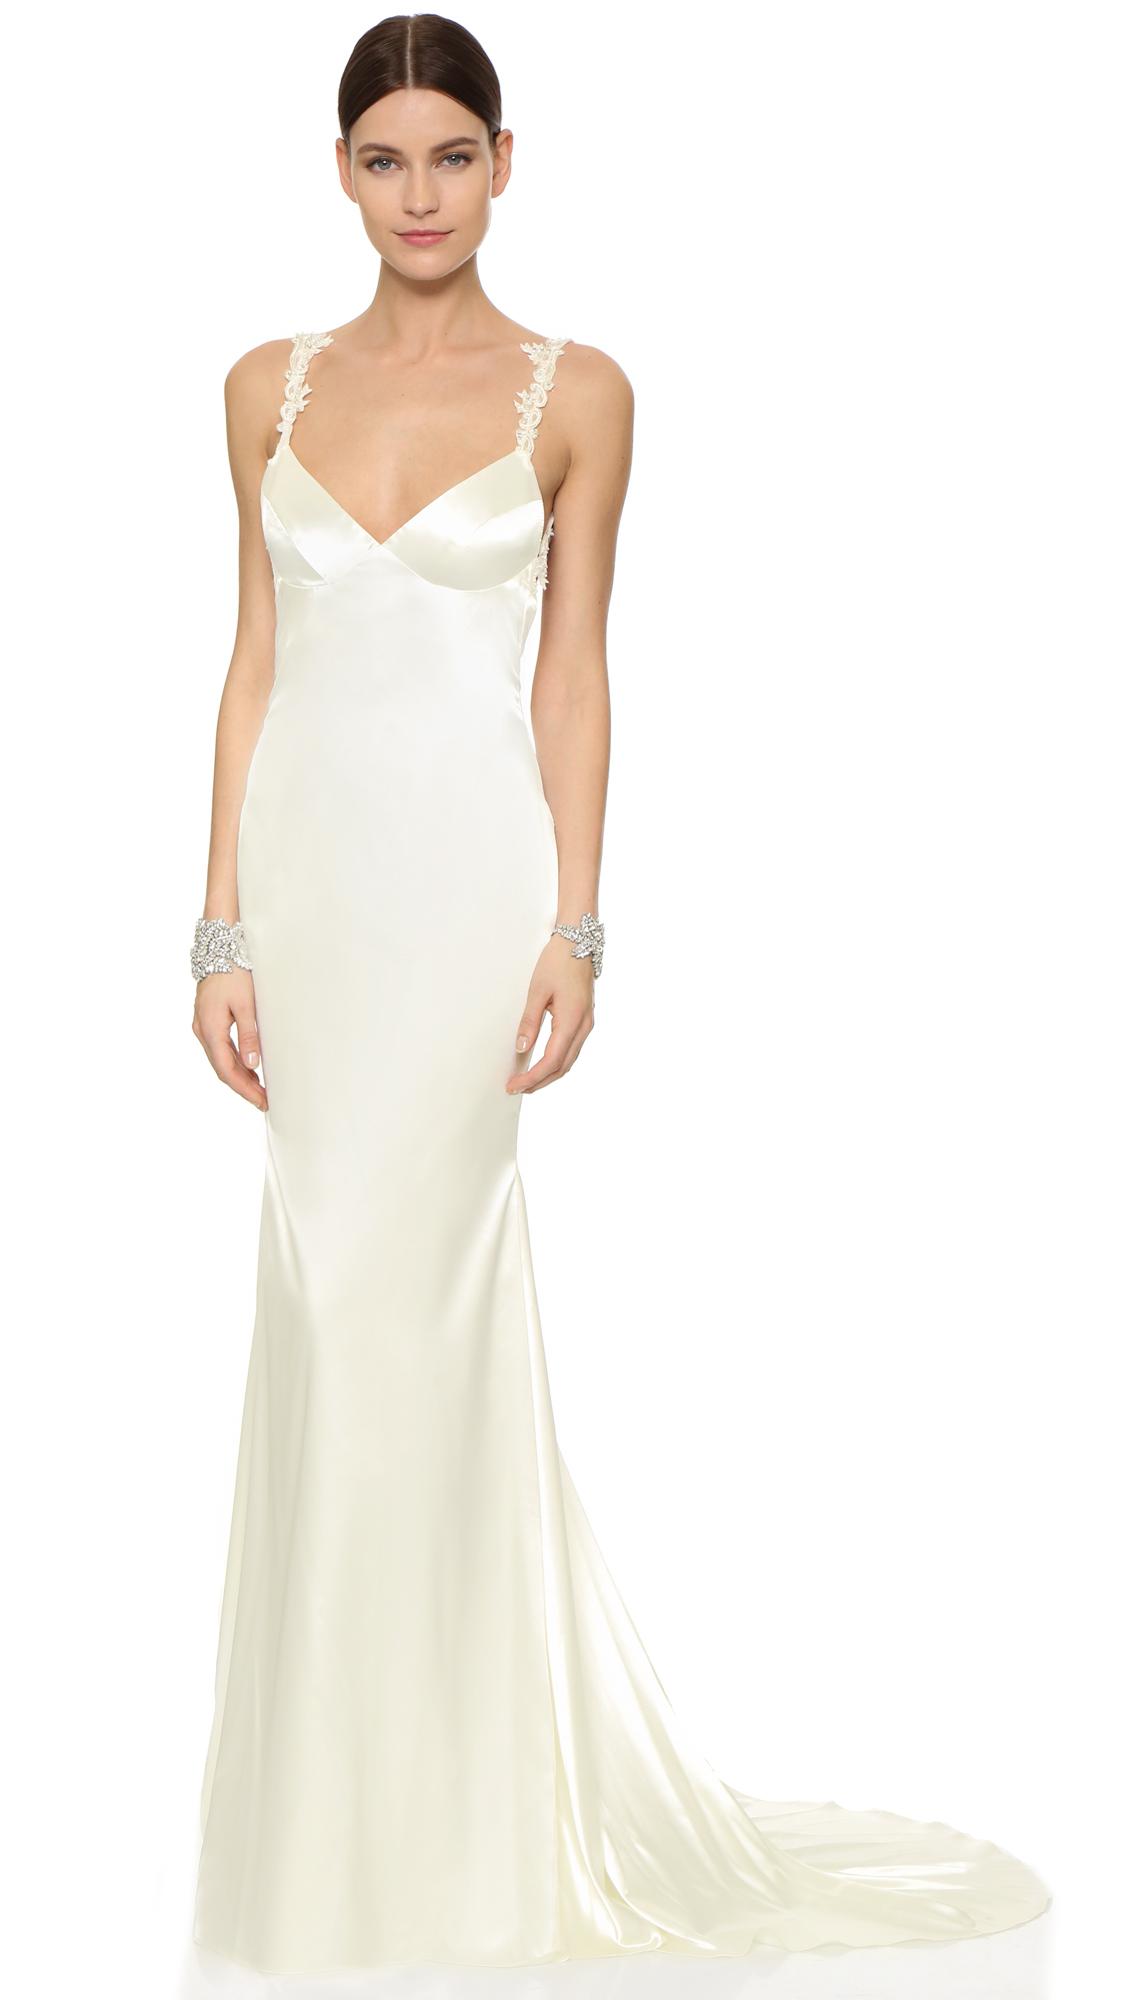 Cheap wedding dresses sydney online travel